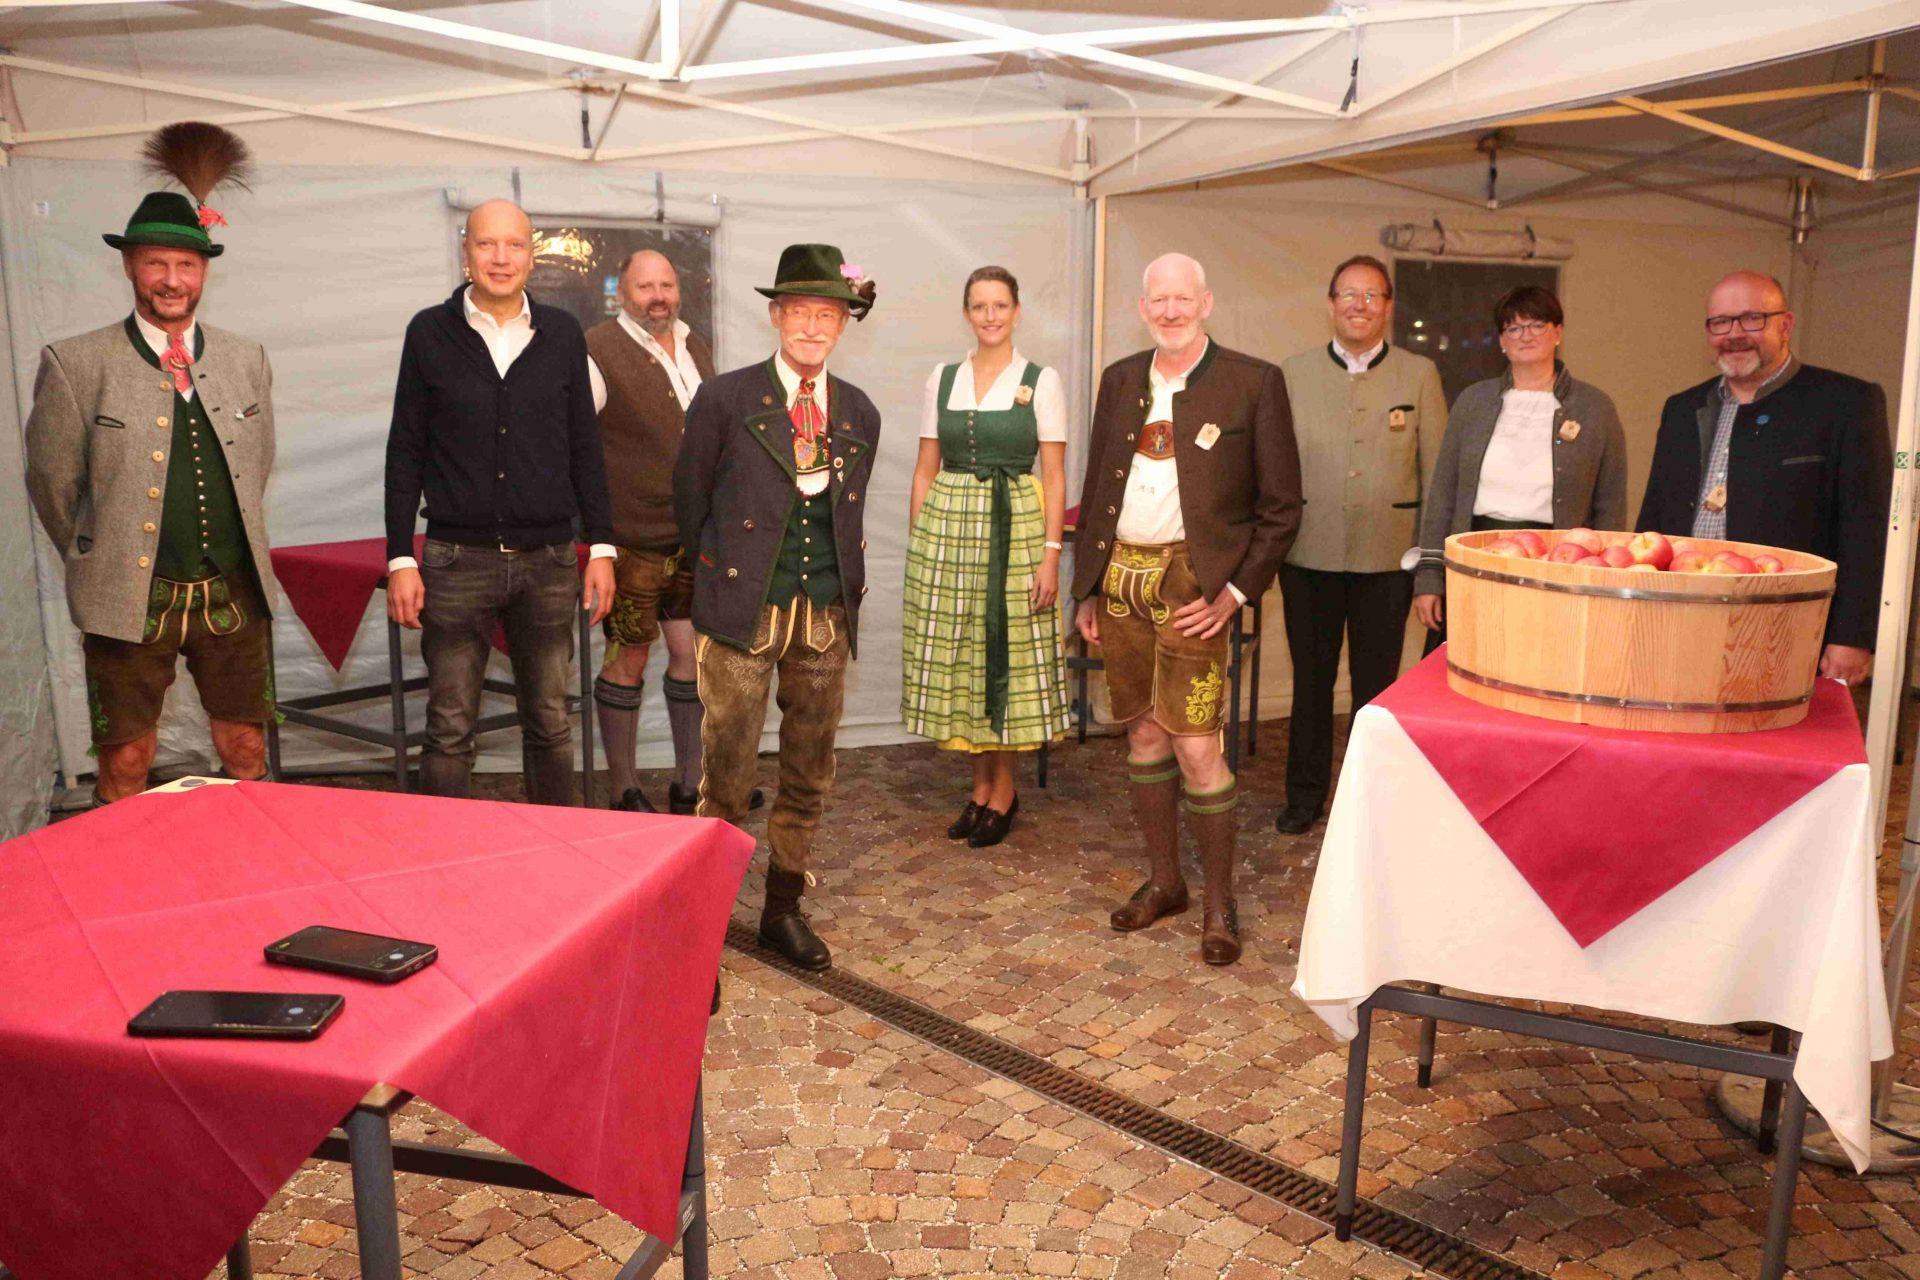 Gäste beim Festabend der Jahrestagung I ©Alfred Moling I Bergsteigerdörfer